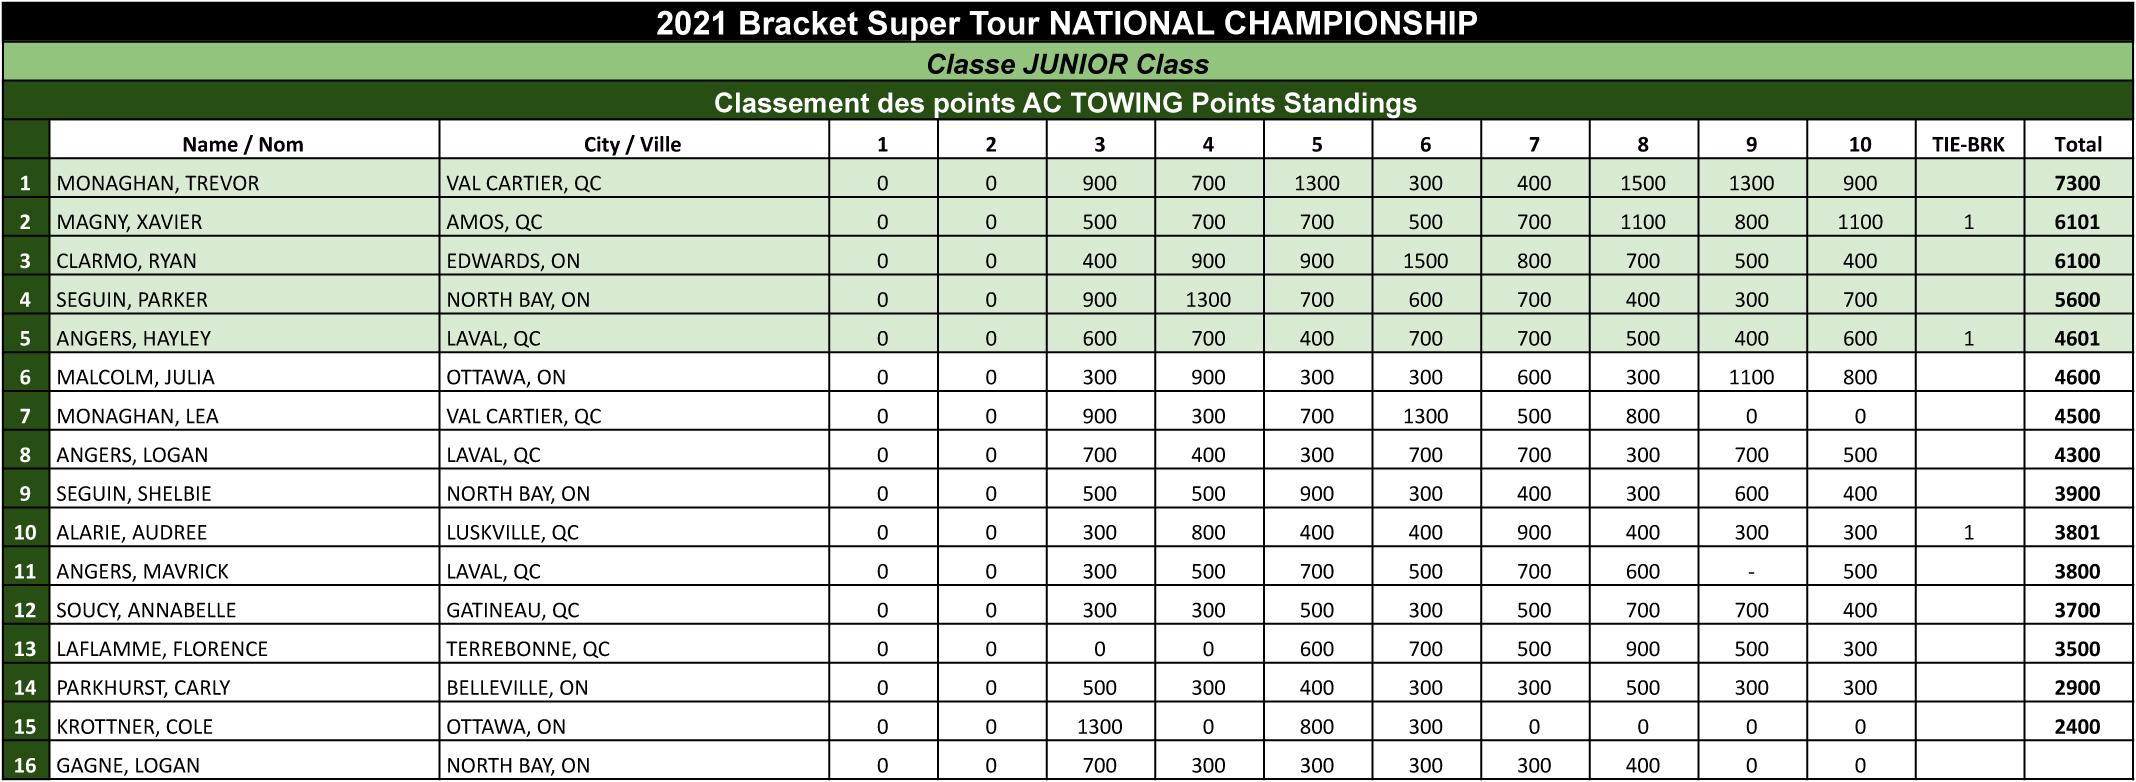 Bracket Super Tour - 2021 Junior Points Standings FINAL